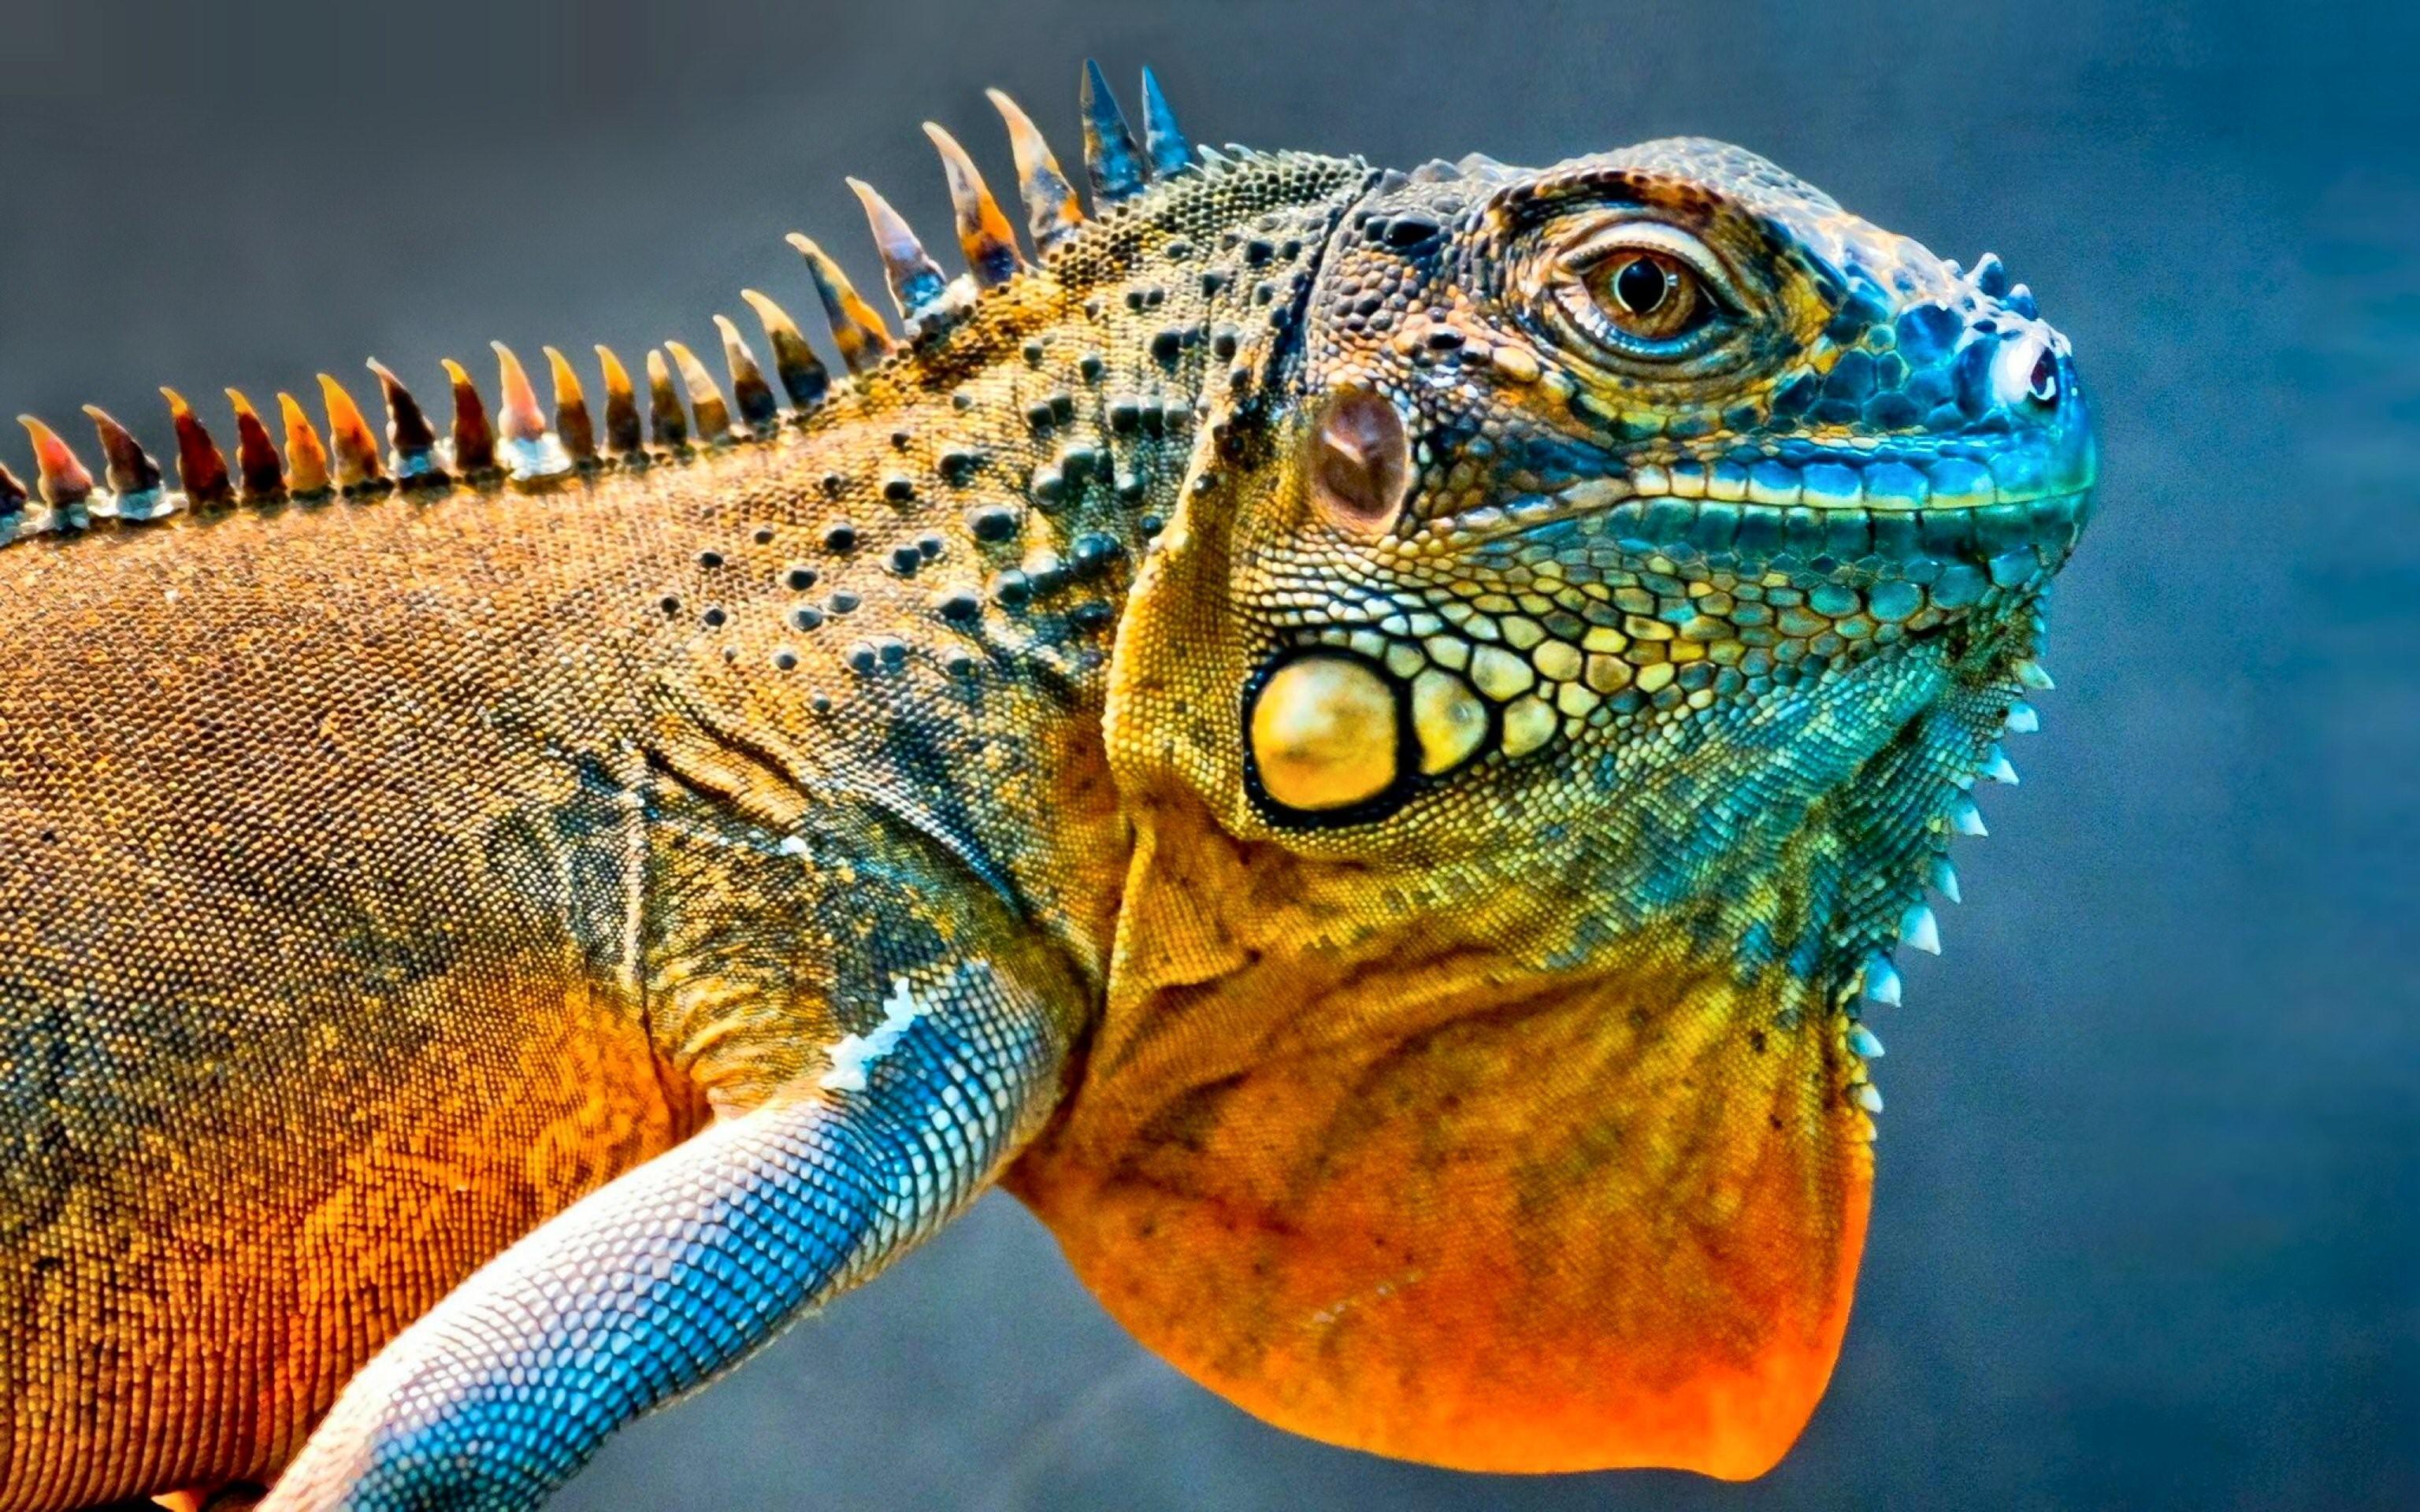 Iguana animal wallpaper en ultra hd - Ultra hd animal wallpapers ...